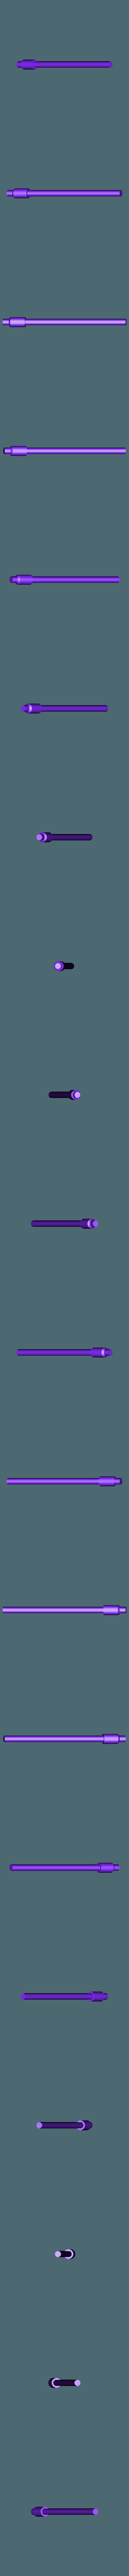 Pièce 7.STL Download STL file Translocator Sombra • 3D print model, Midnight_05